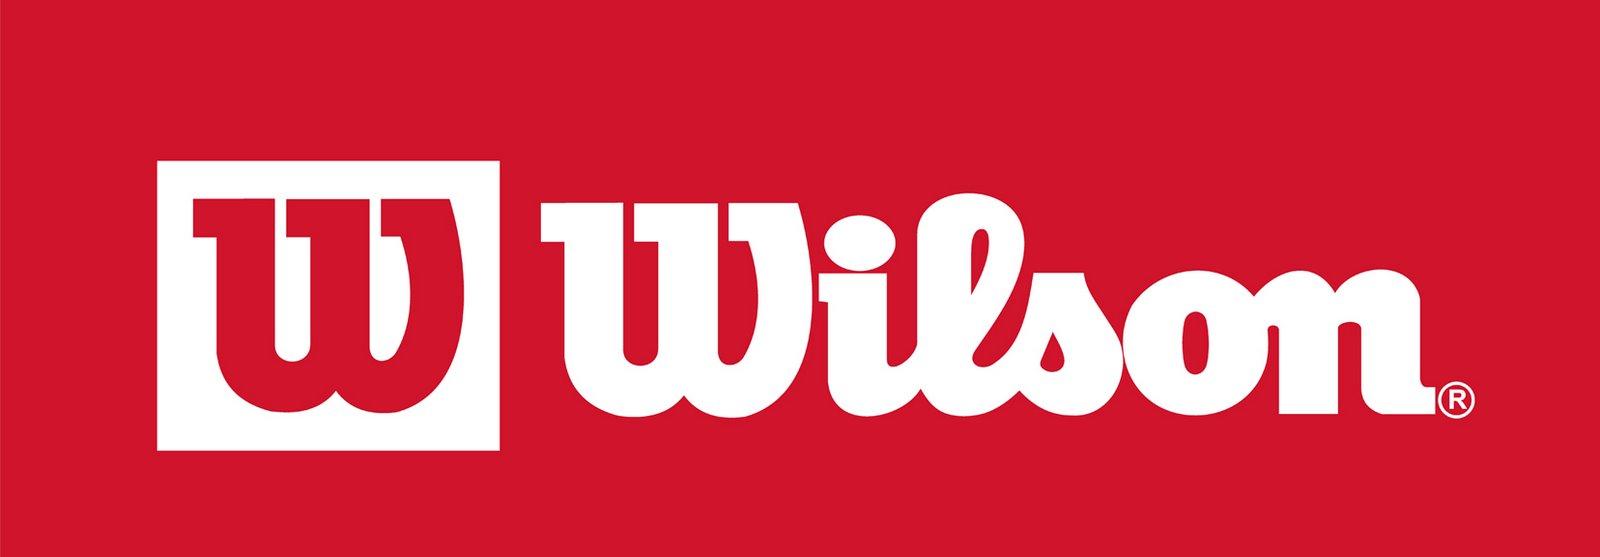 wilson_logo-746456